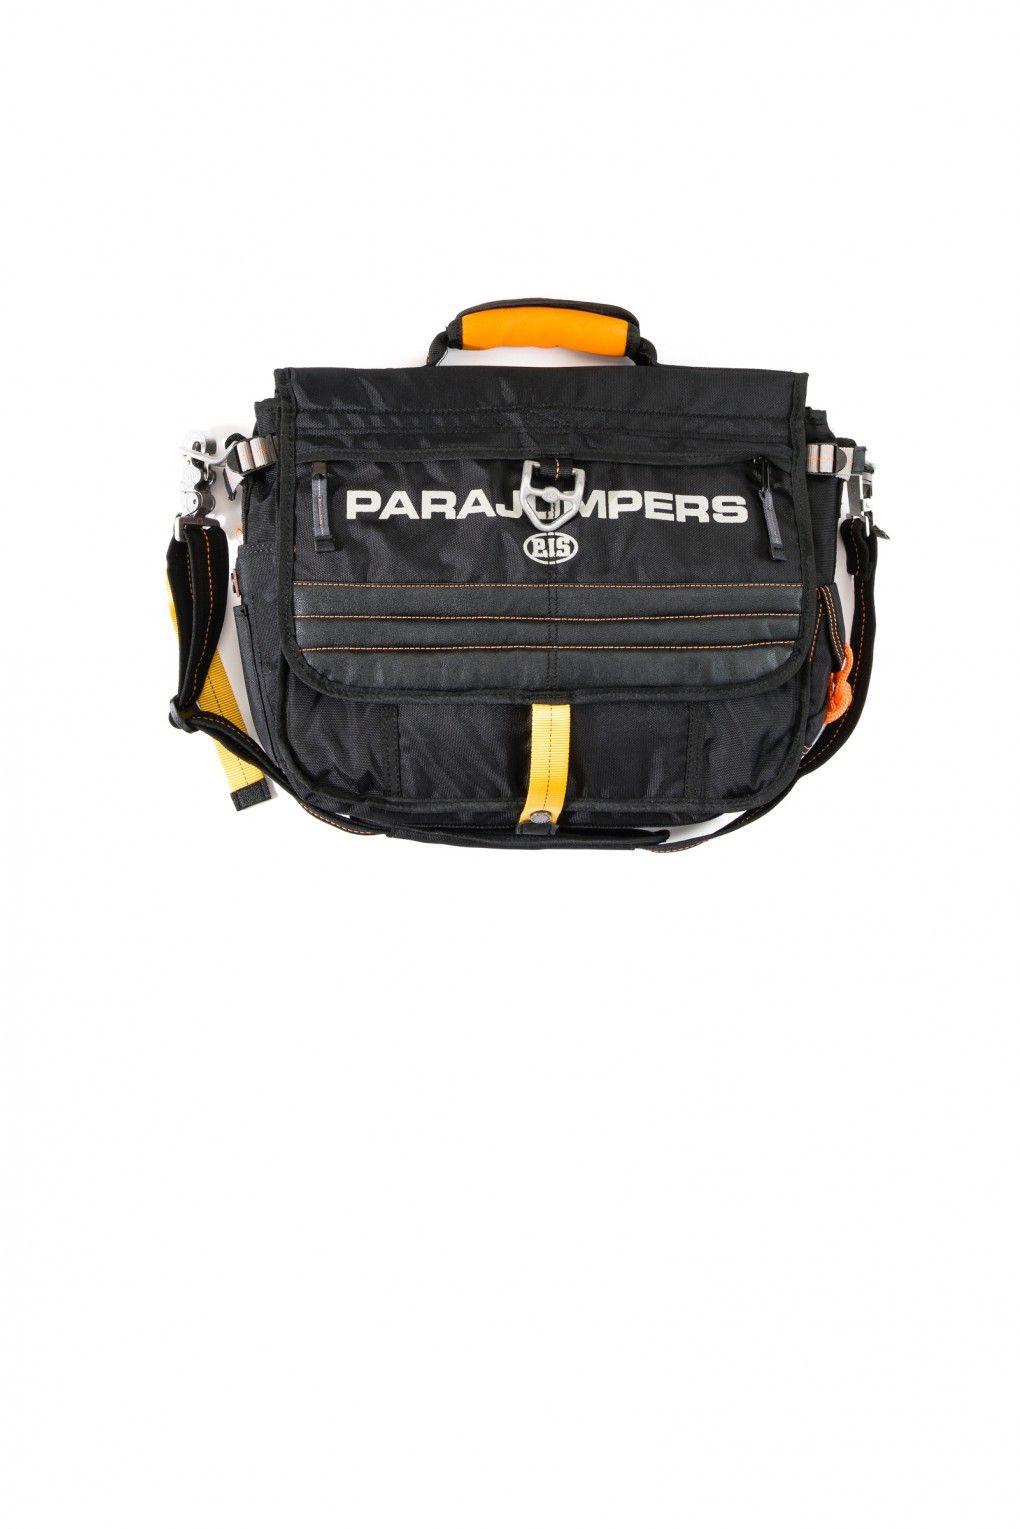 LAP TOP BAG - accessories - MAN | Parajumpers